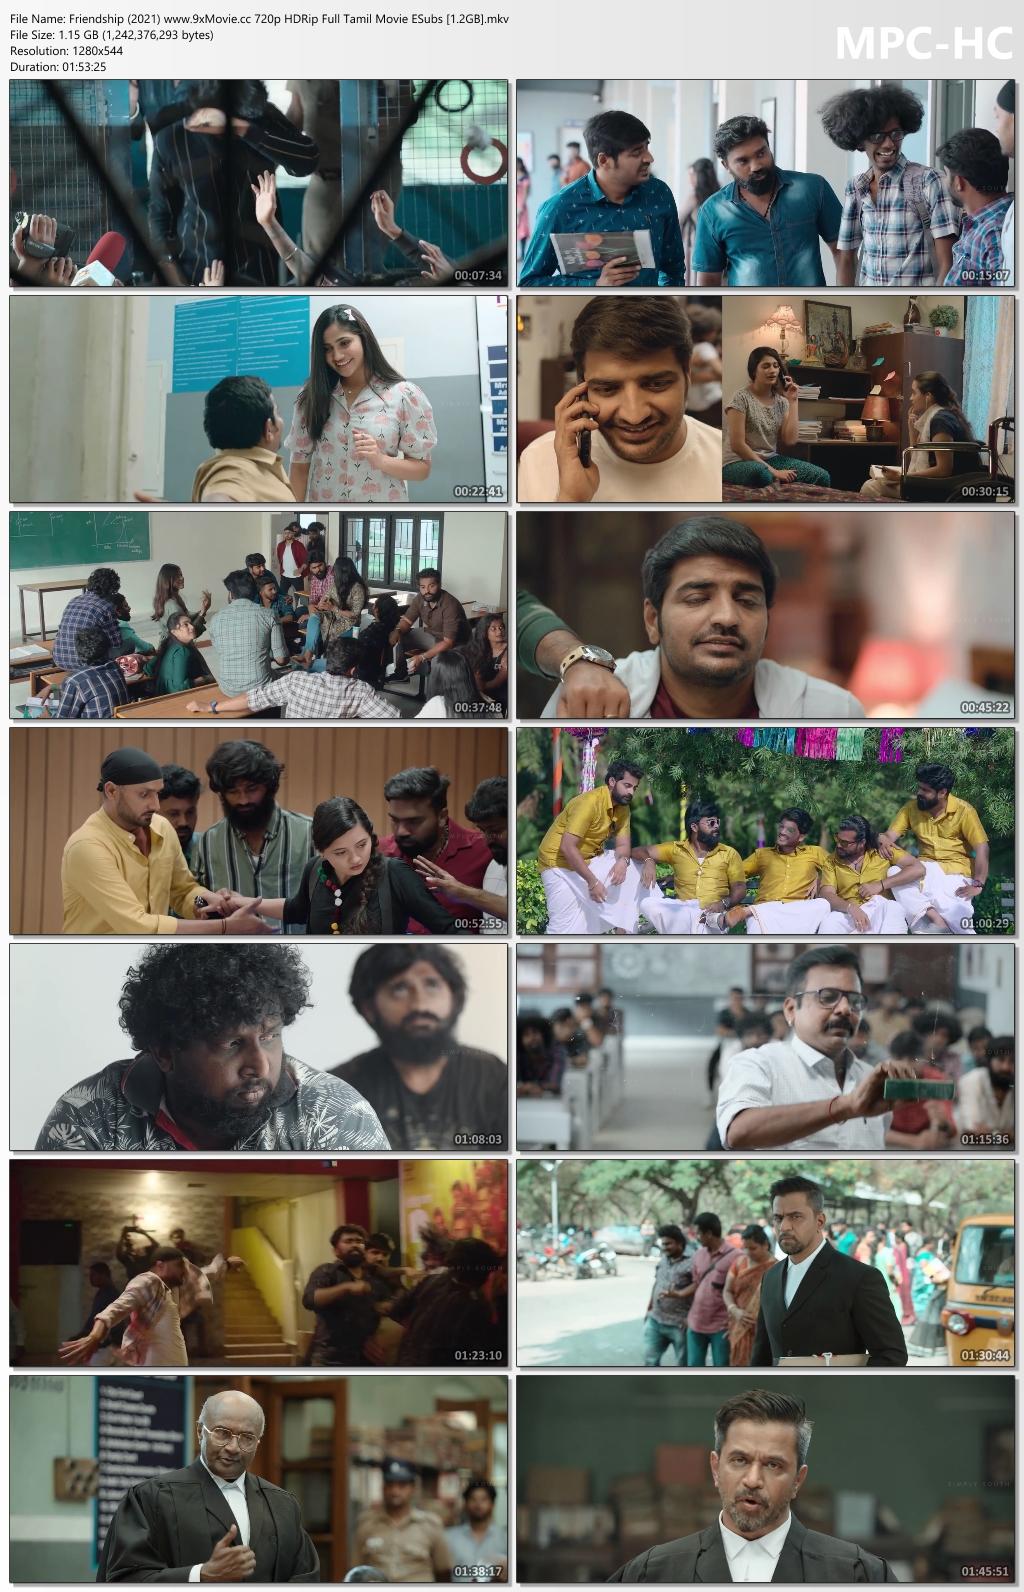 Friendship-2021-www-9x-Movie-cc-720p-HDRip-Full-Tamil-Movie-ESubs-1-2-GB-mkv